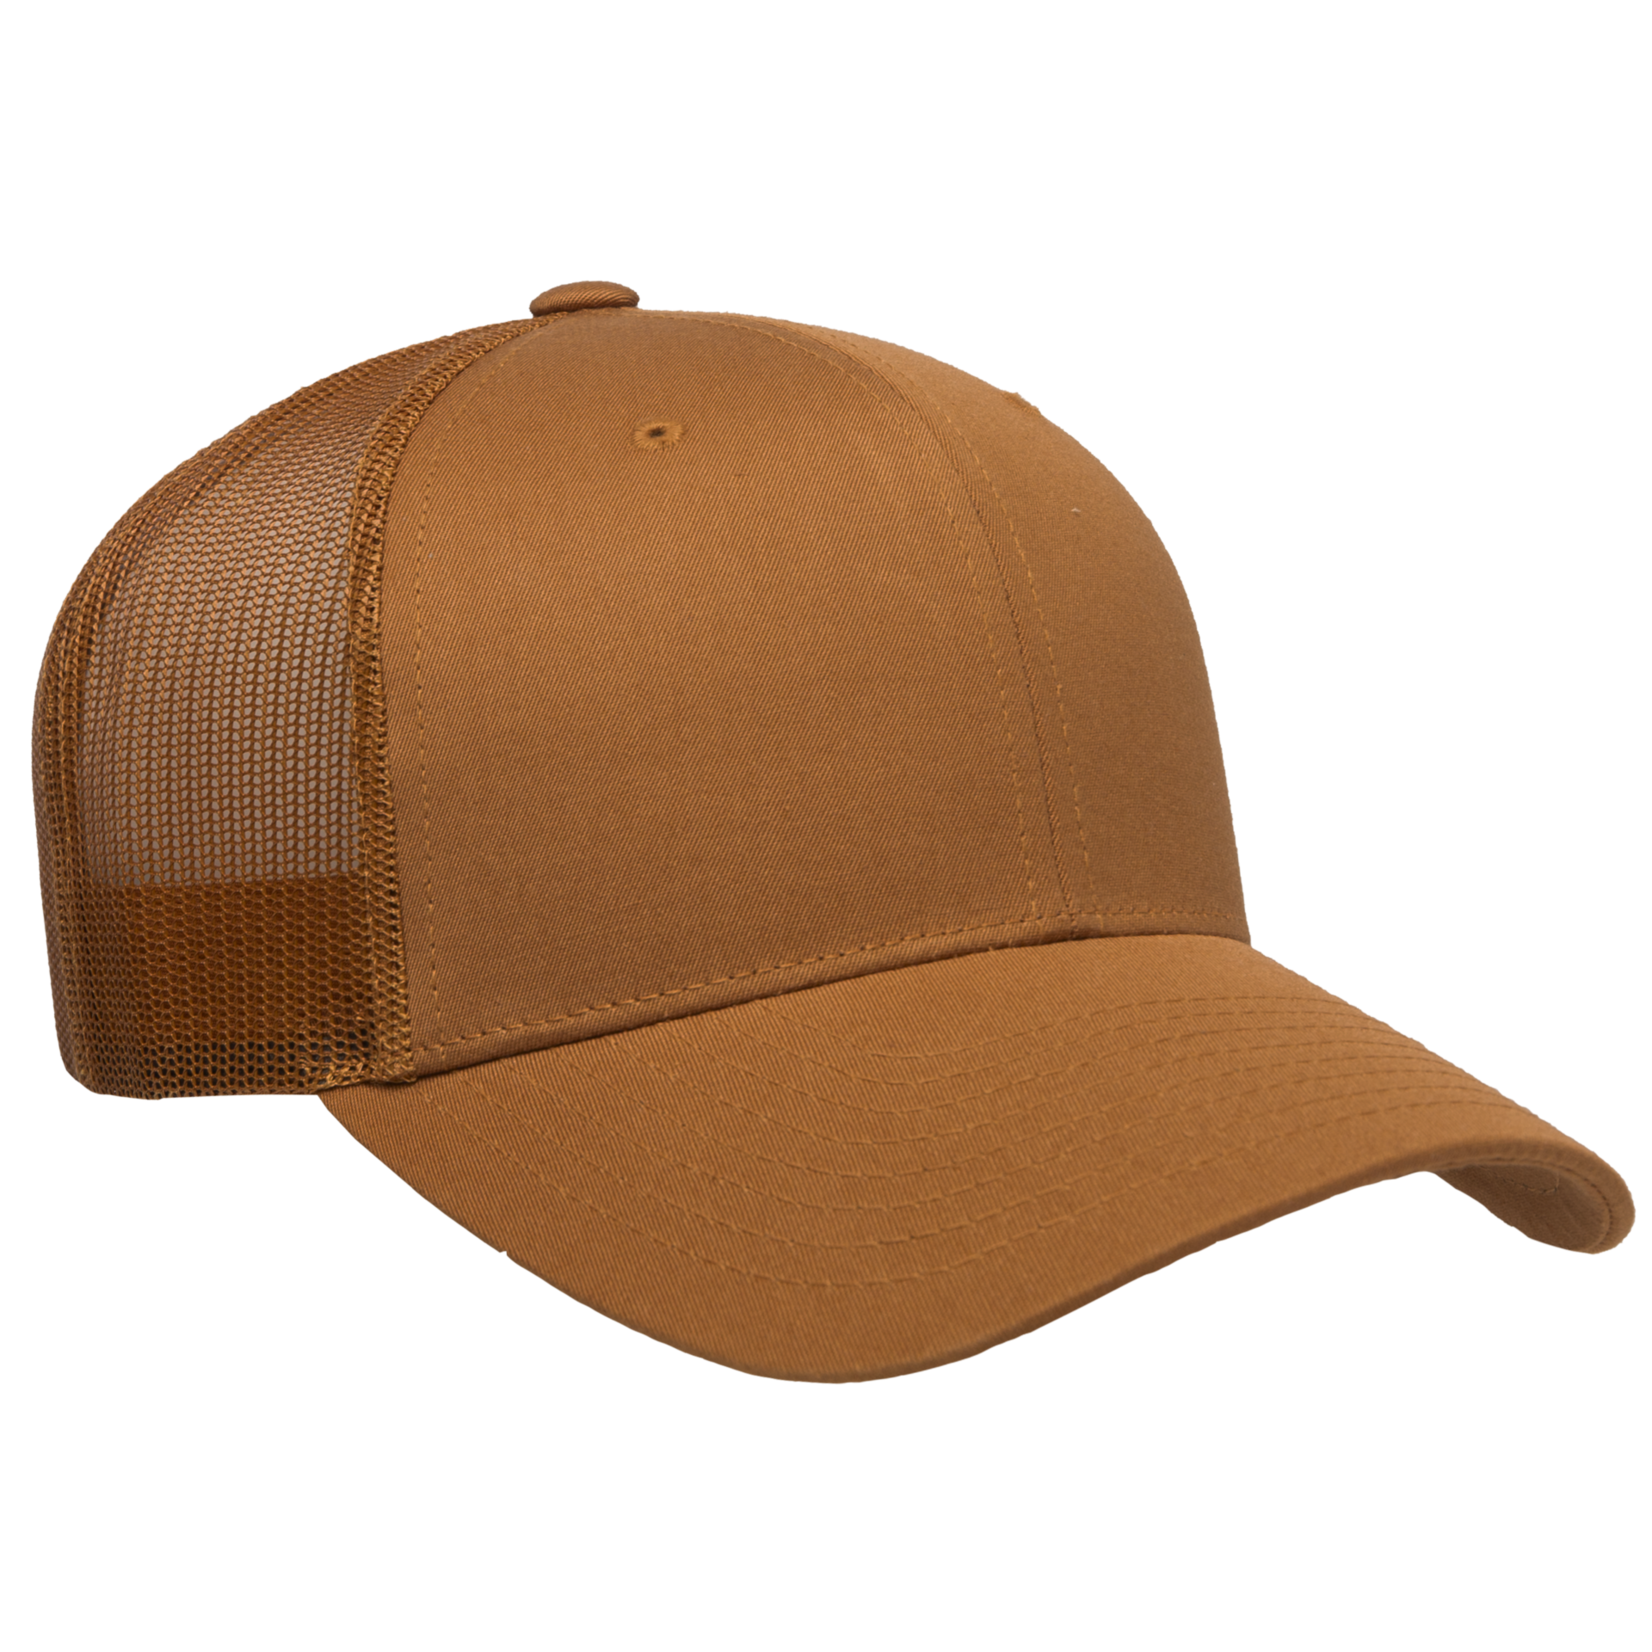 Flexfit Flexfit 6606 Classic Snapback Trucker Hat - Solid Caramel